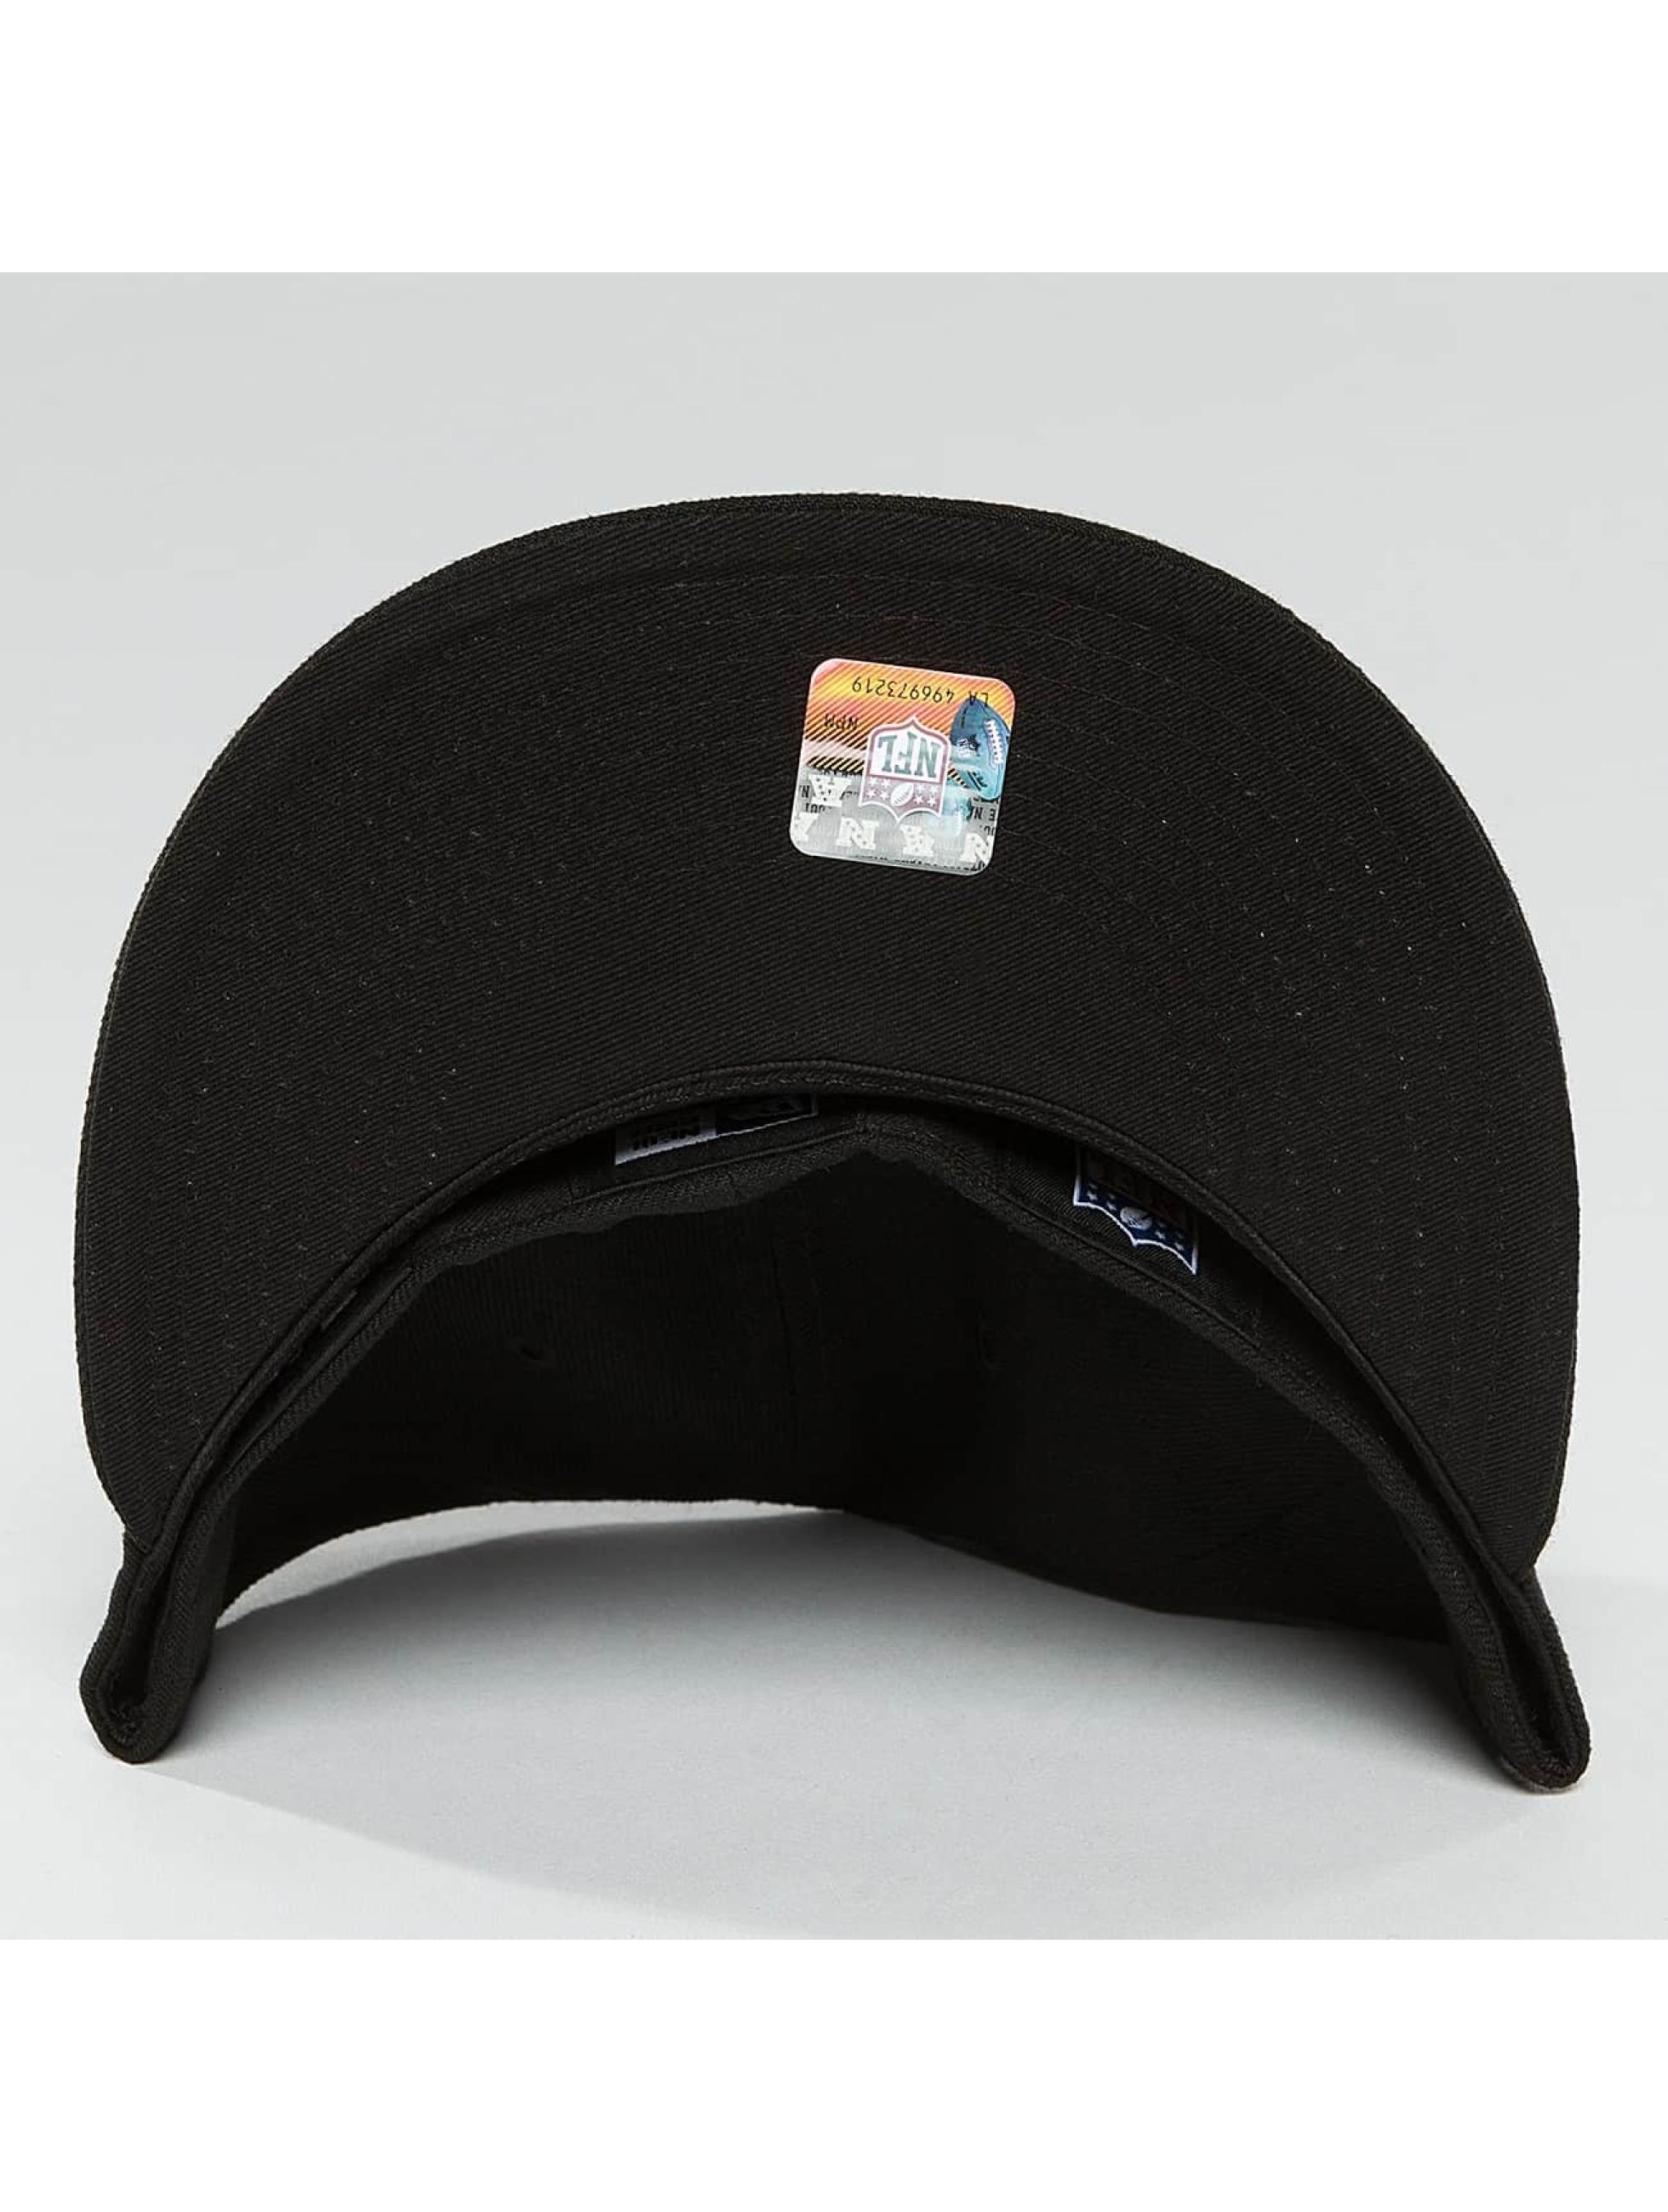 New Era Fitted Cap Black Graphite New England Patriots 59Fifty schwarz